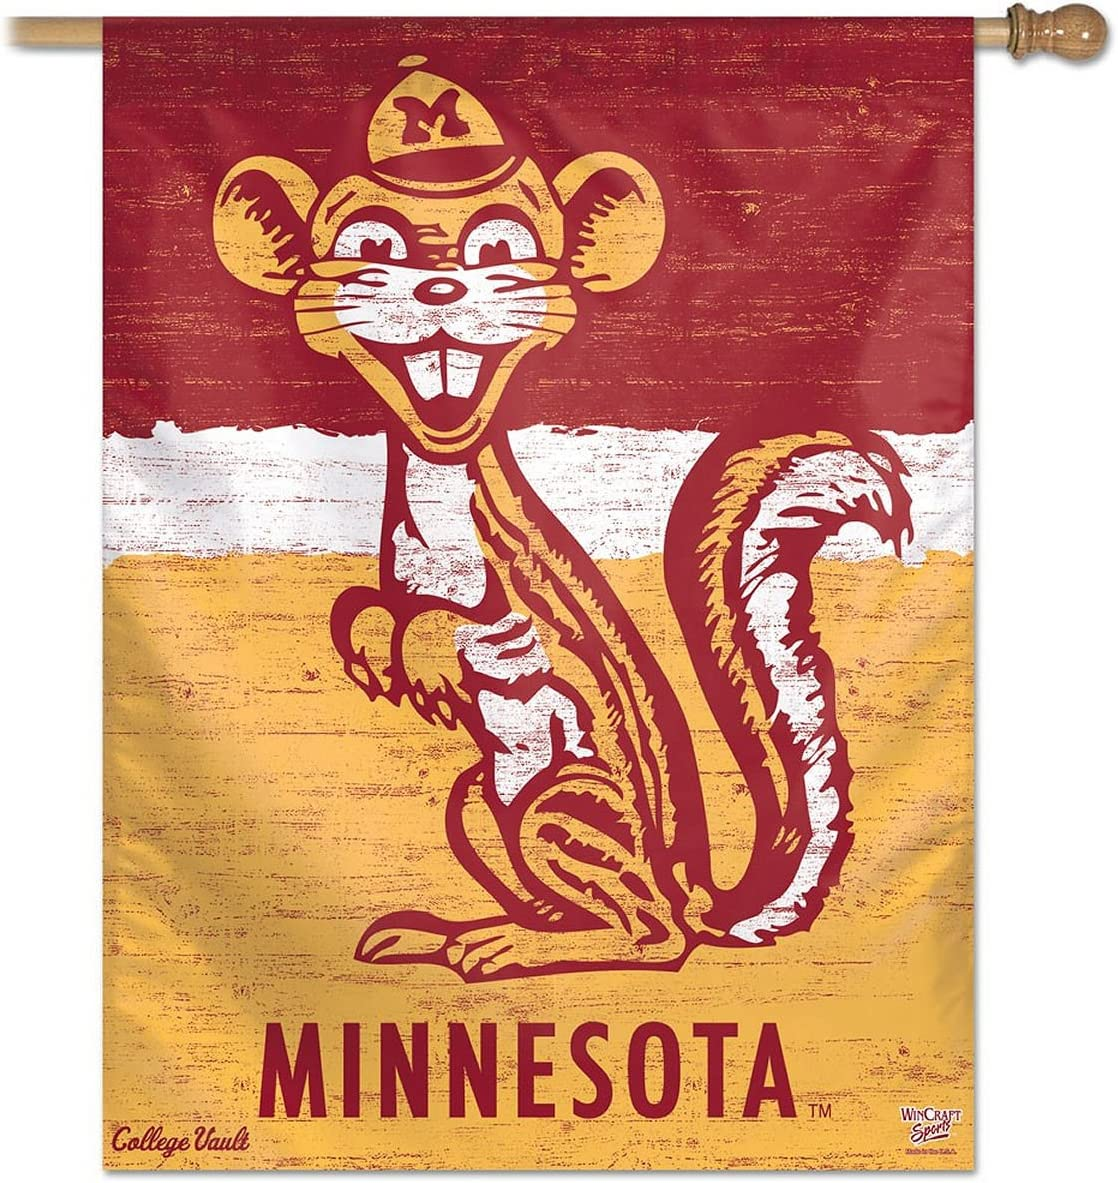 Minnesota Golden Gophers Official NCAA 27x27 Banner Flag by Wincraft